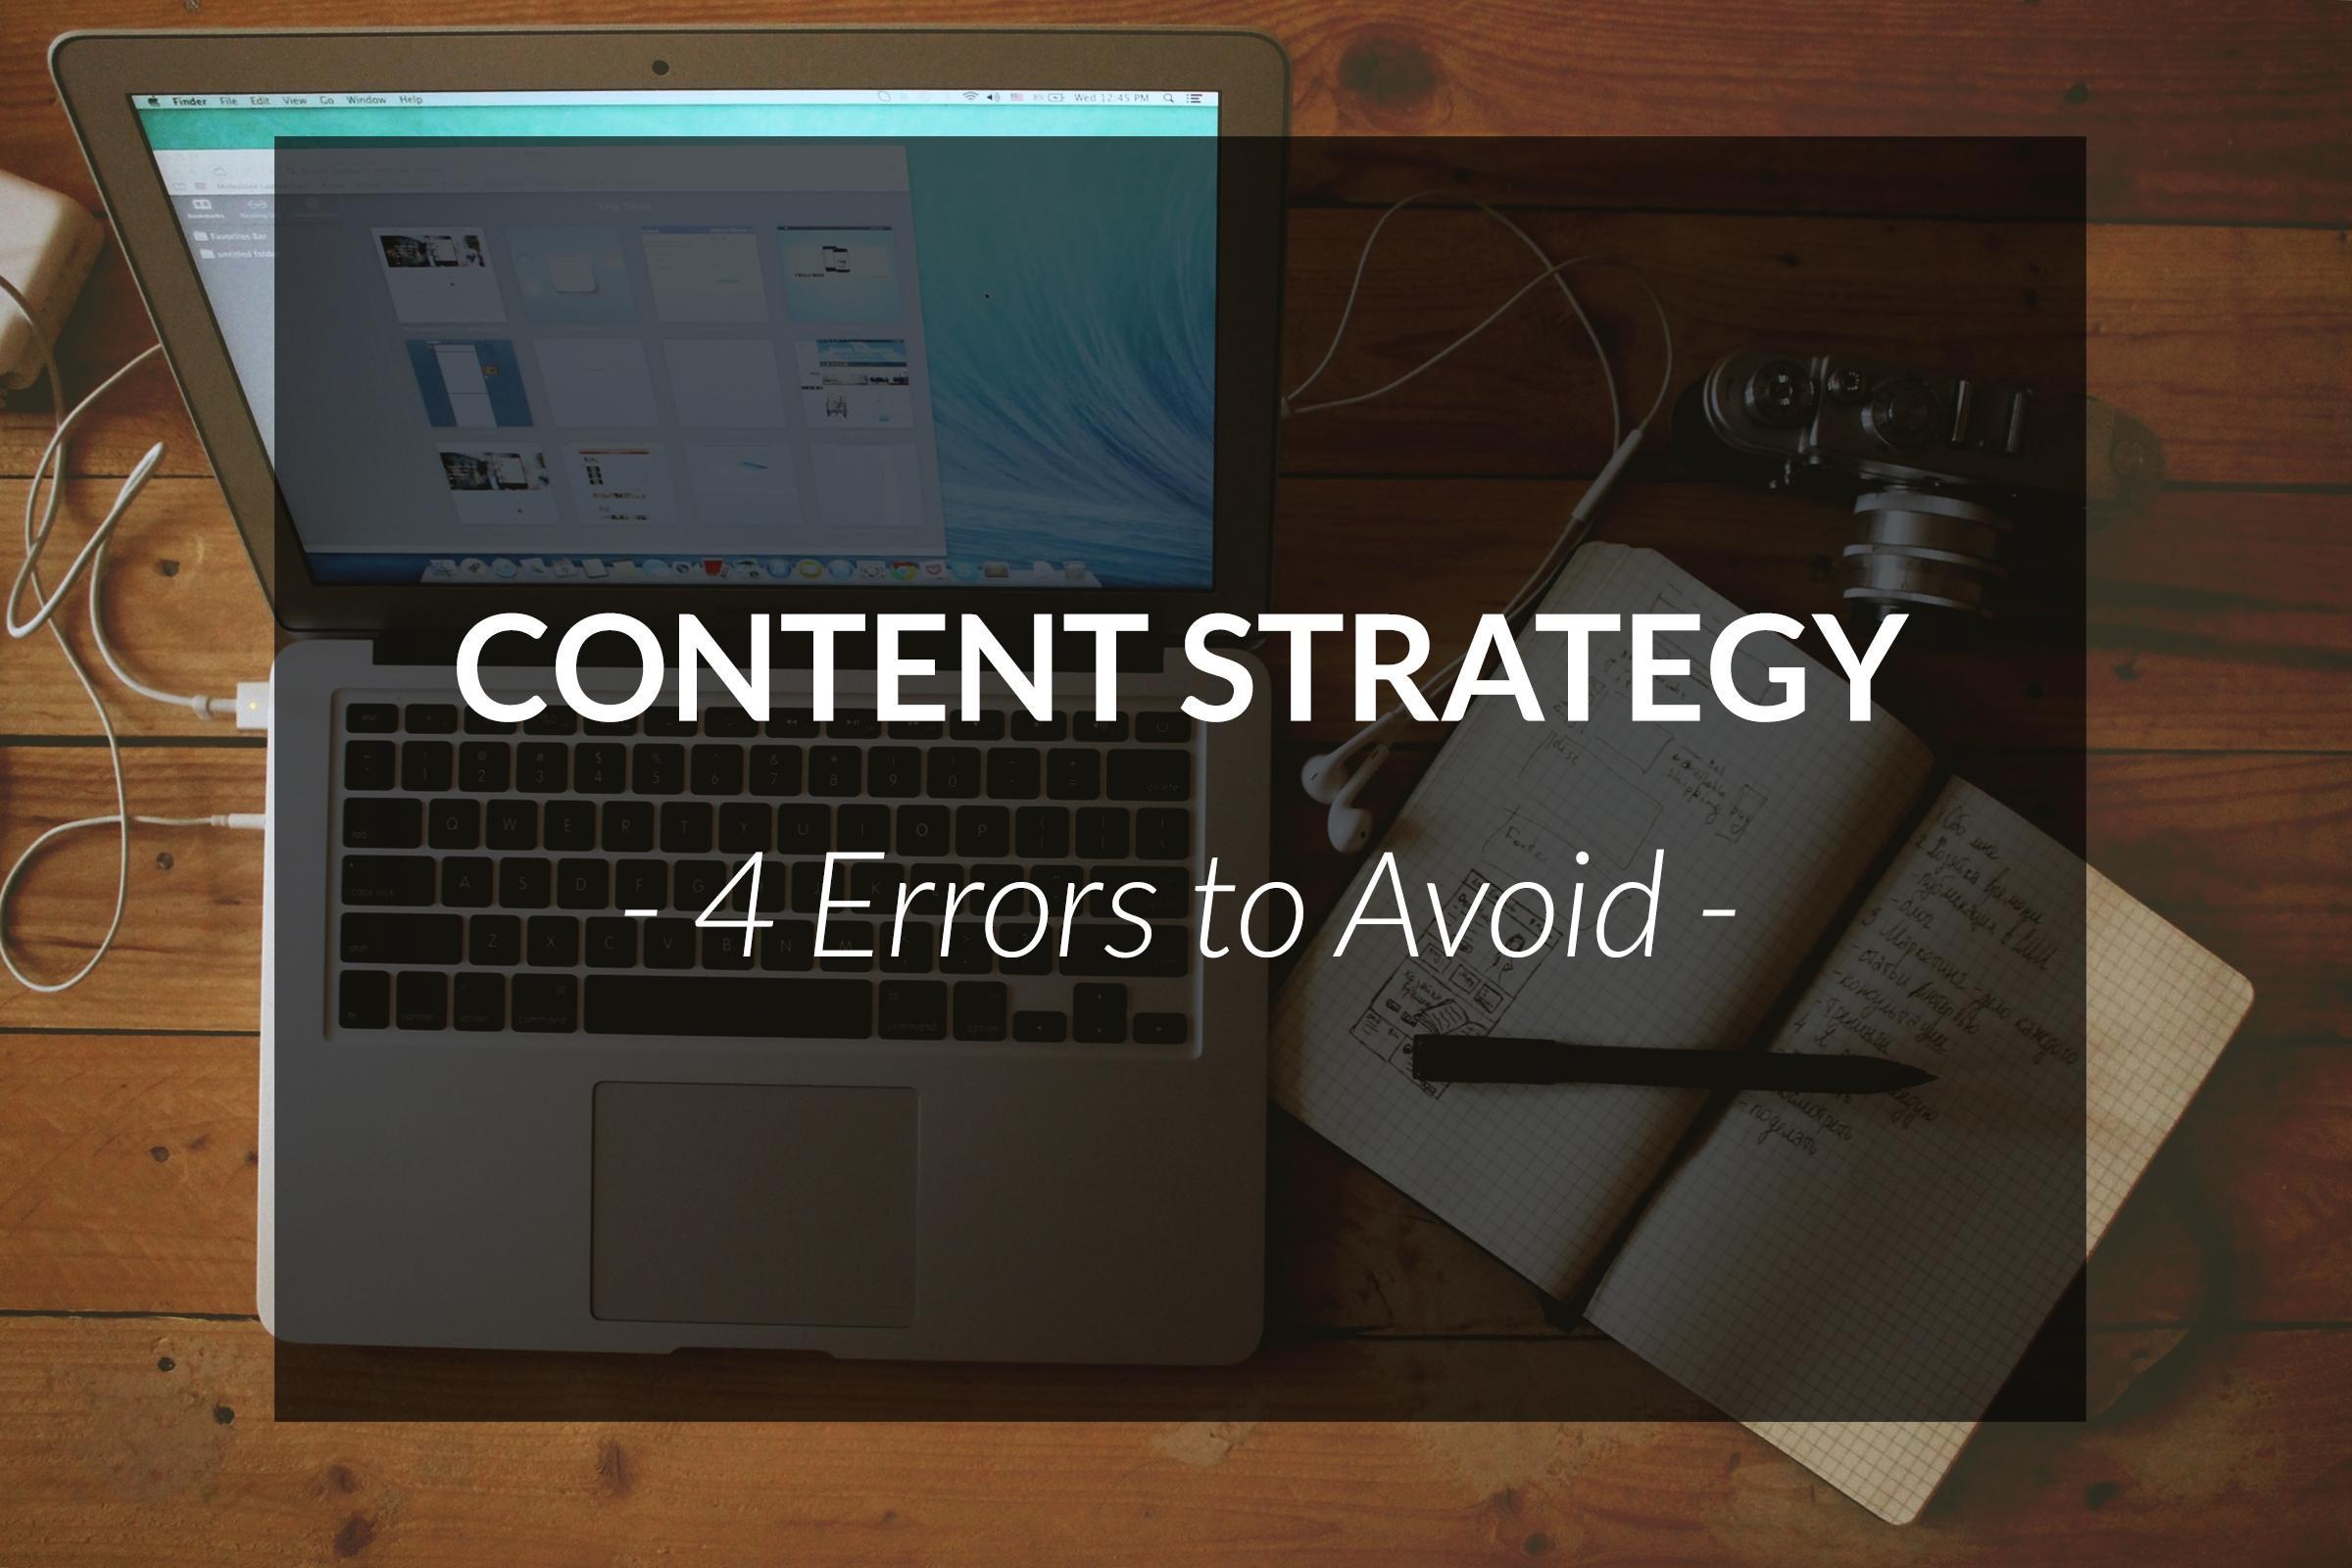 Stratégie de Contenu - 4 Erreurs à Éviter